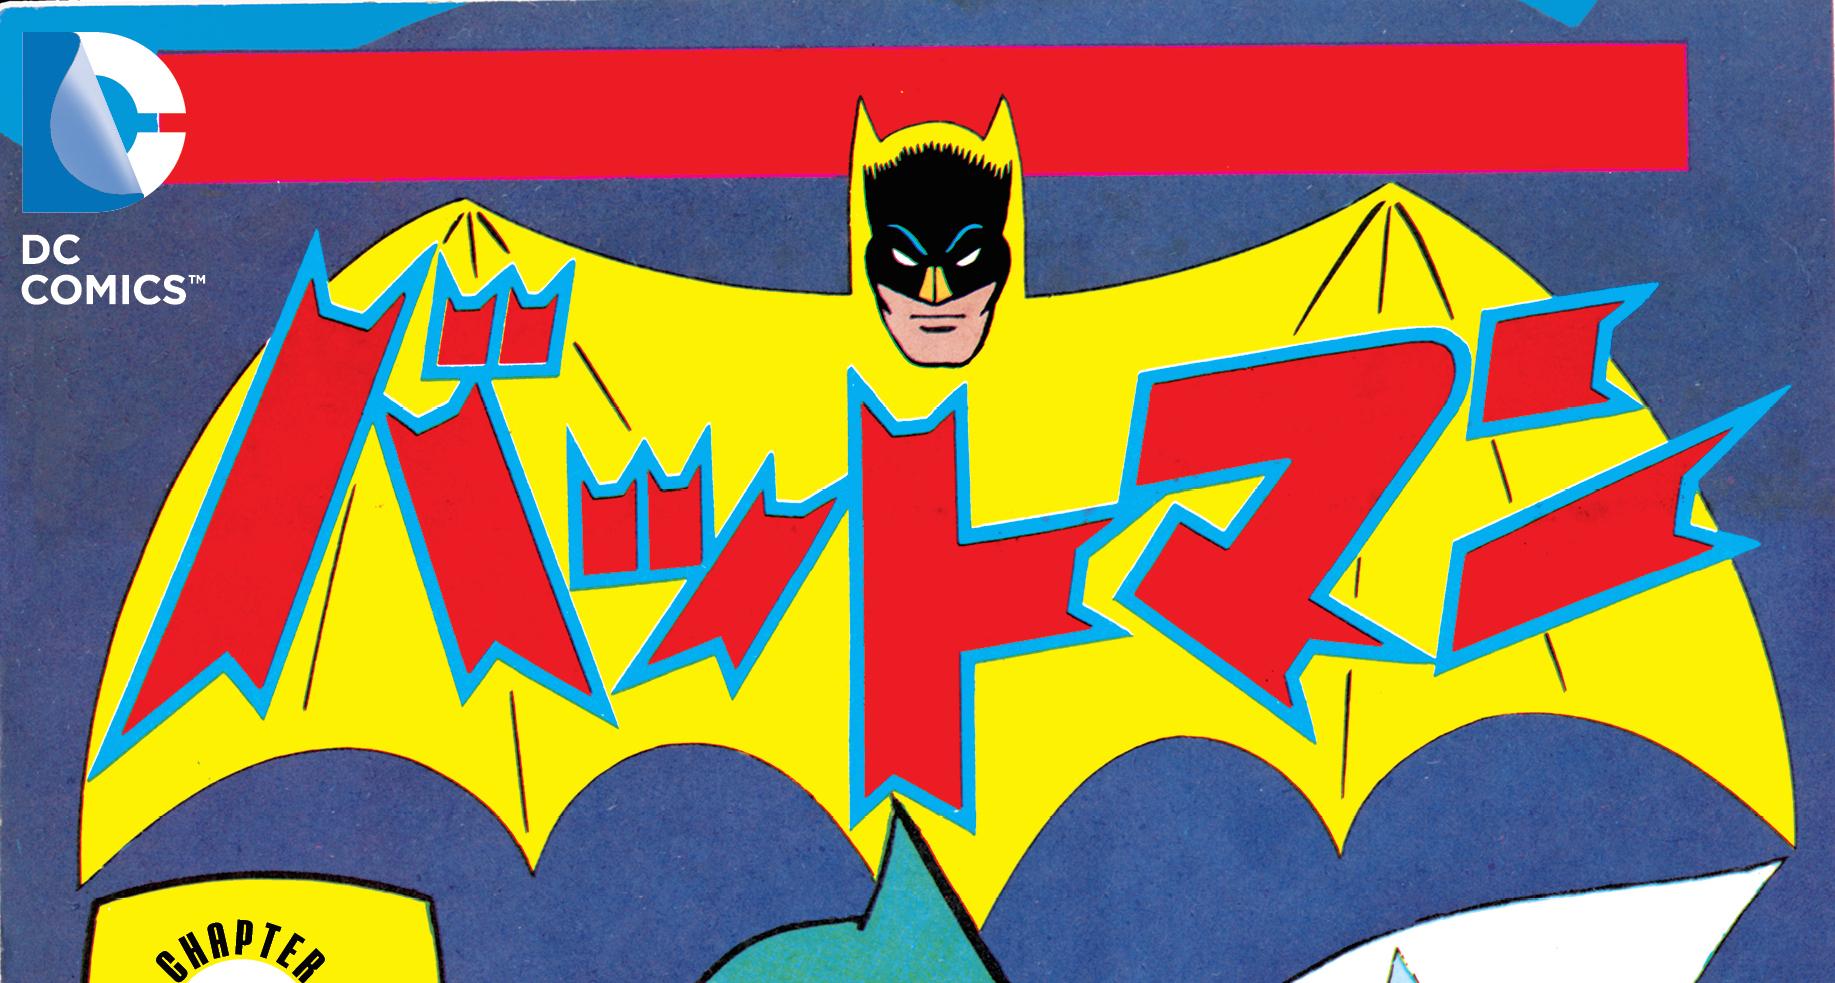 Batmanga 49_Storefront cover copy 2